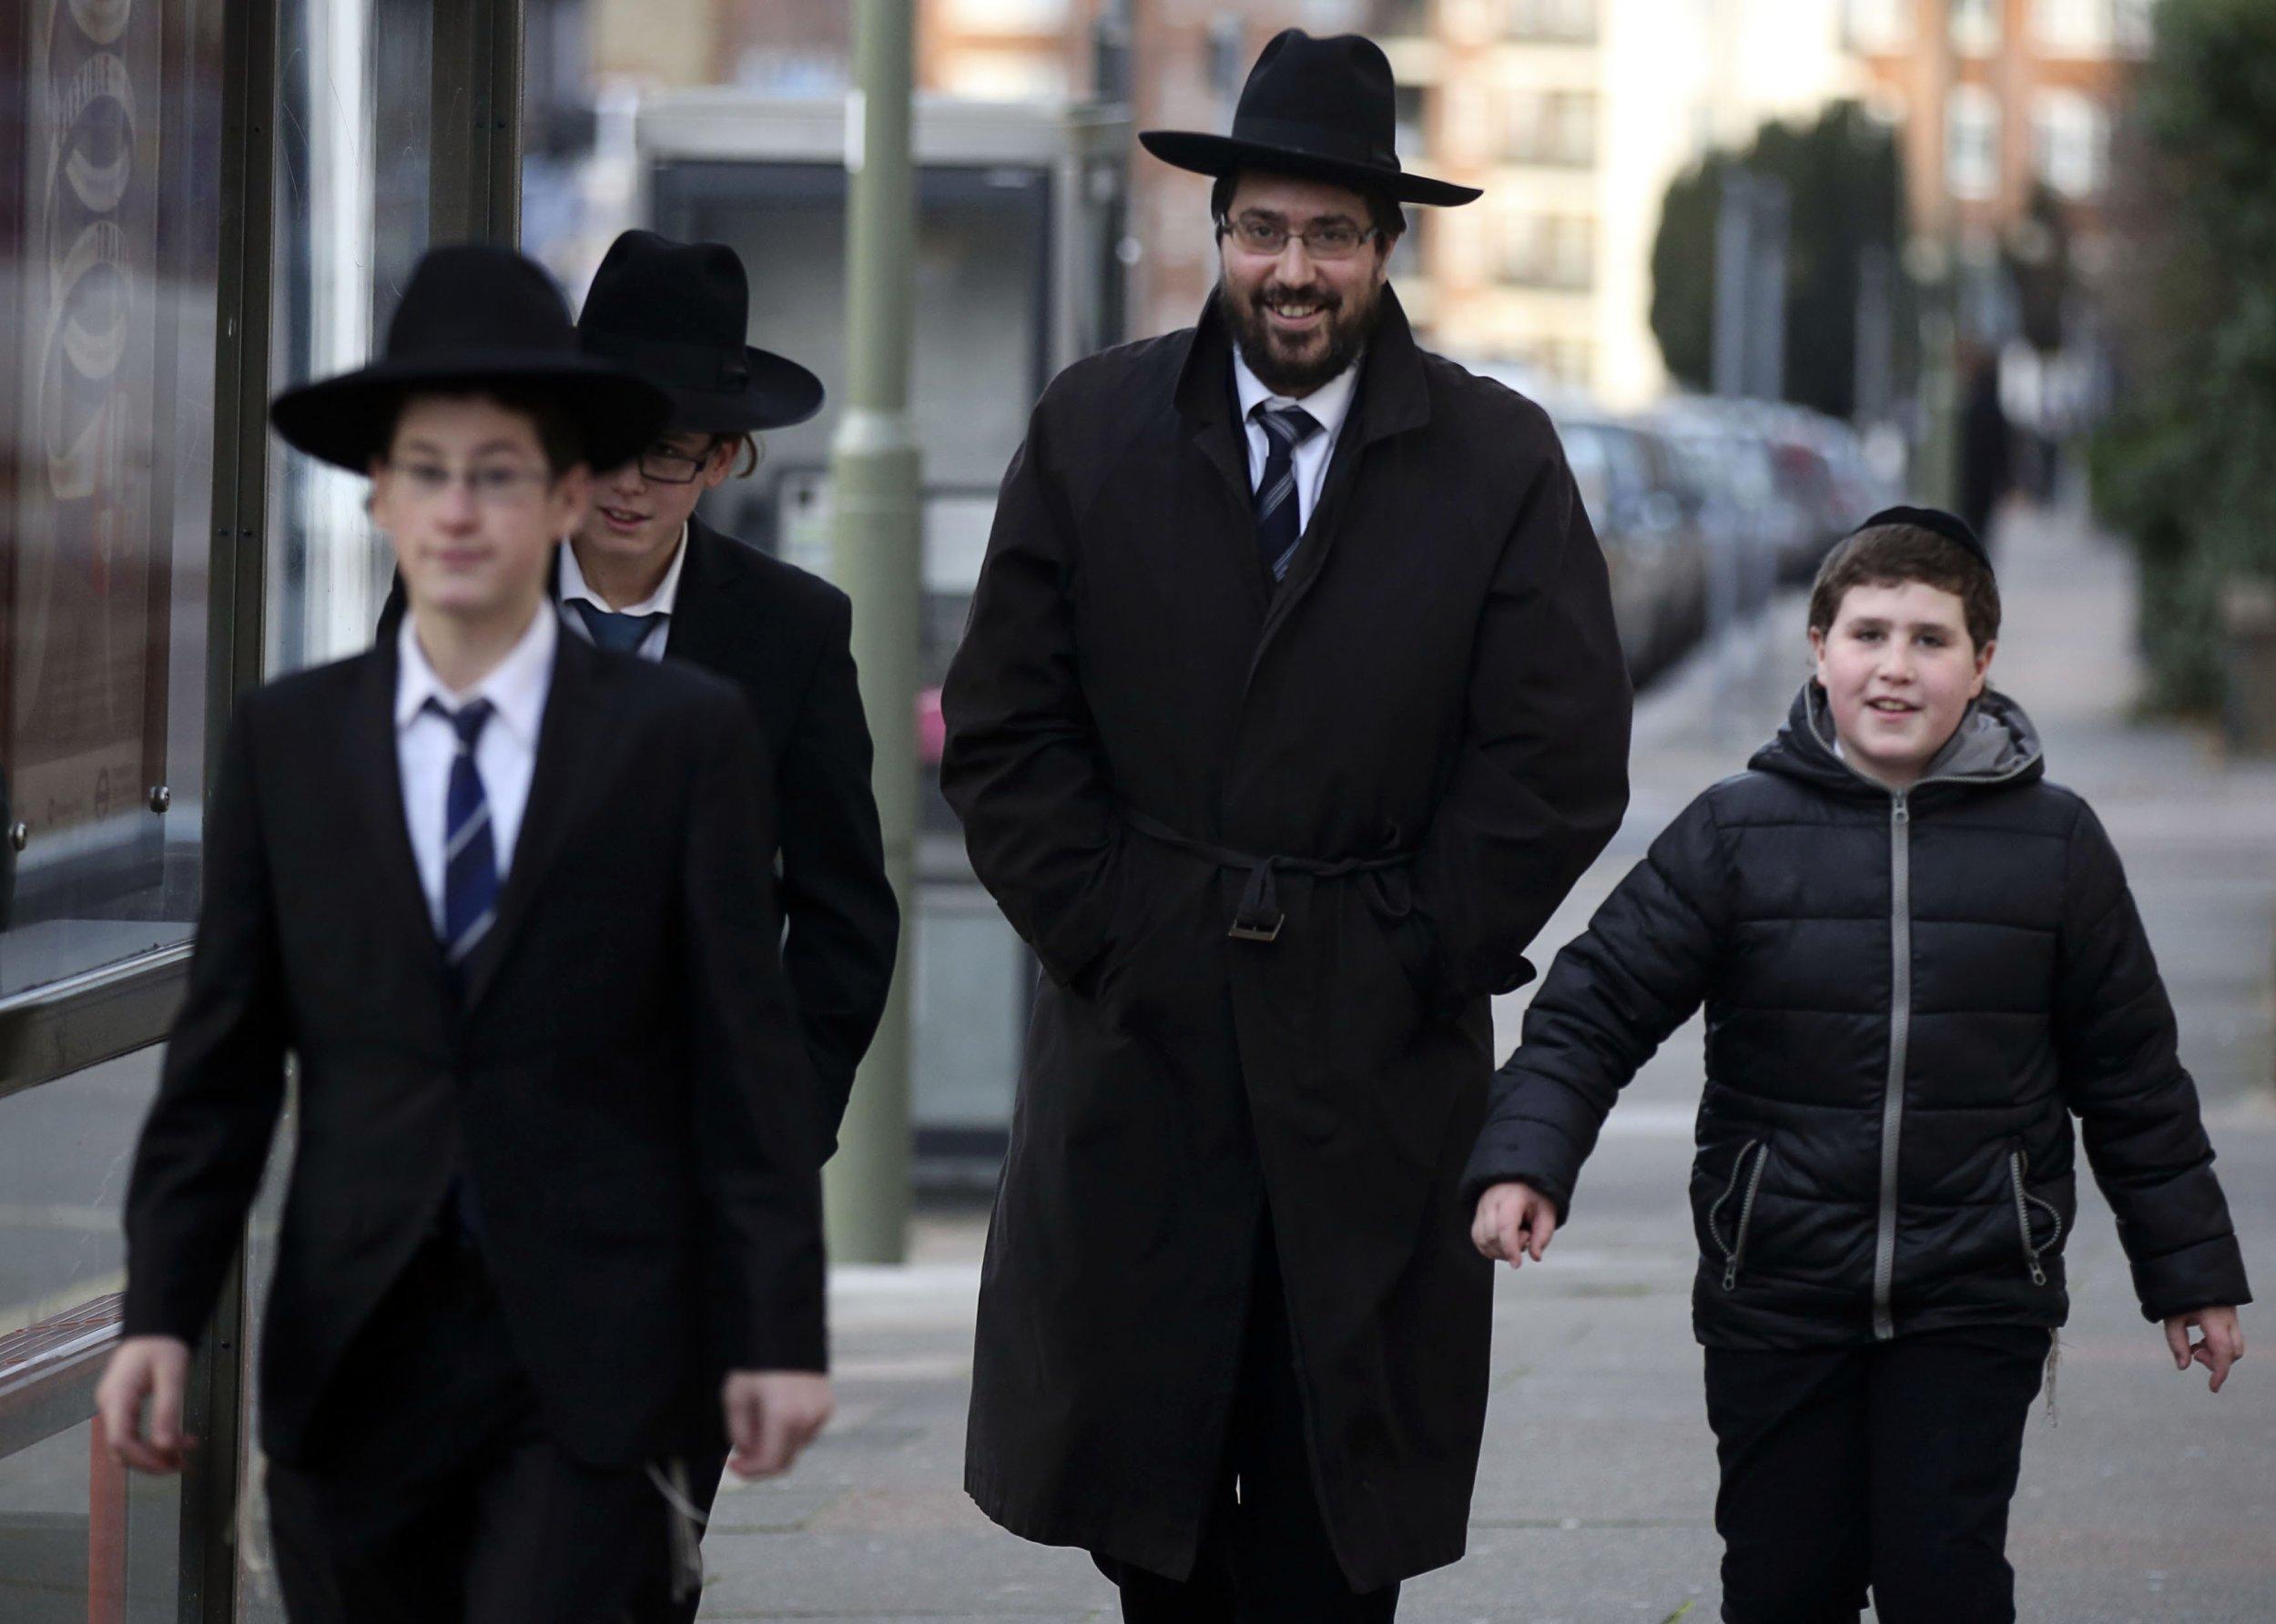 0112_London_Jews_France_01